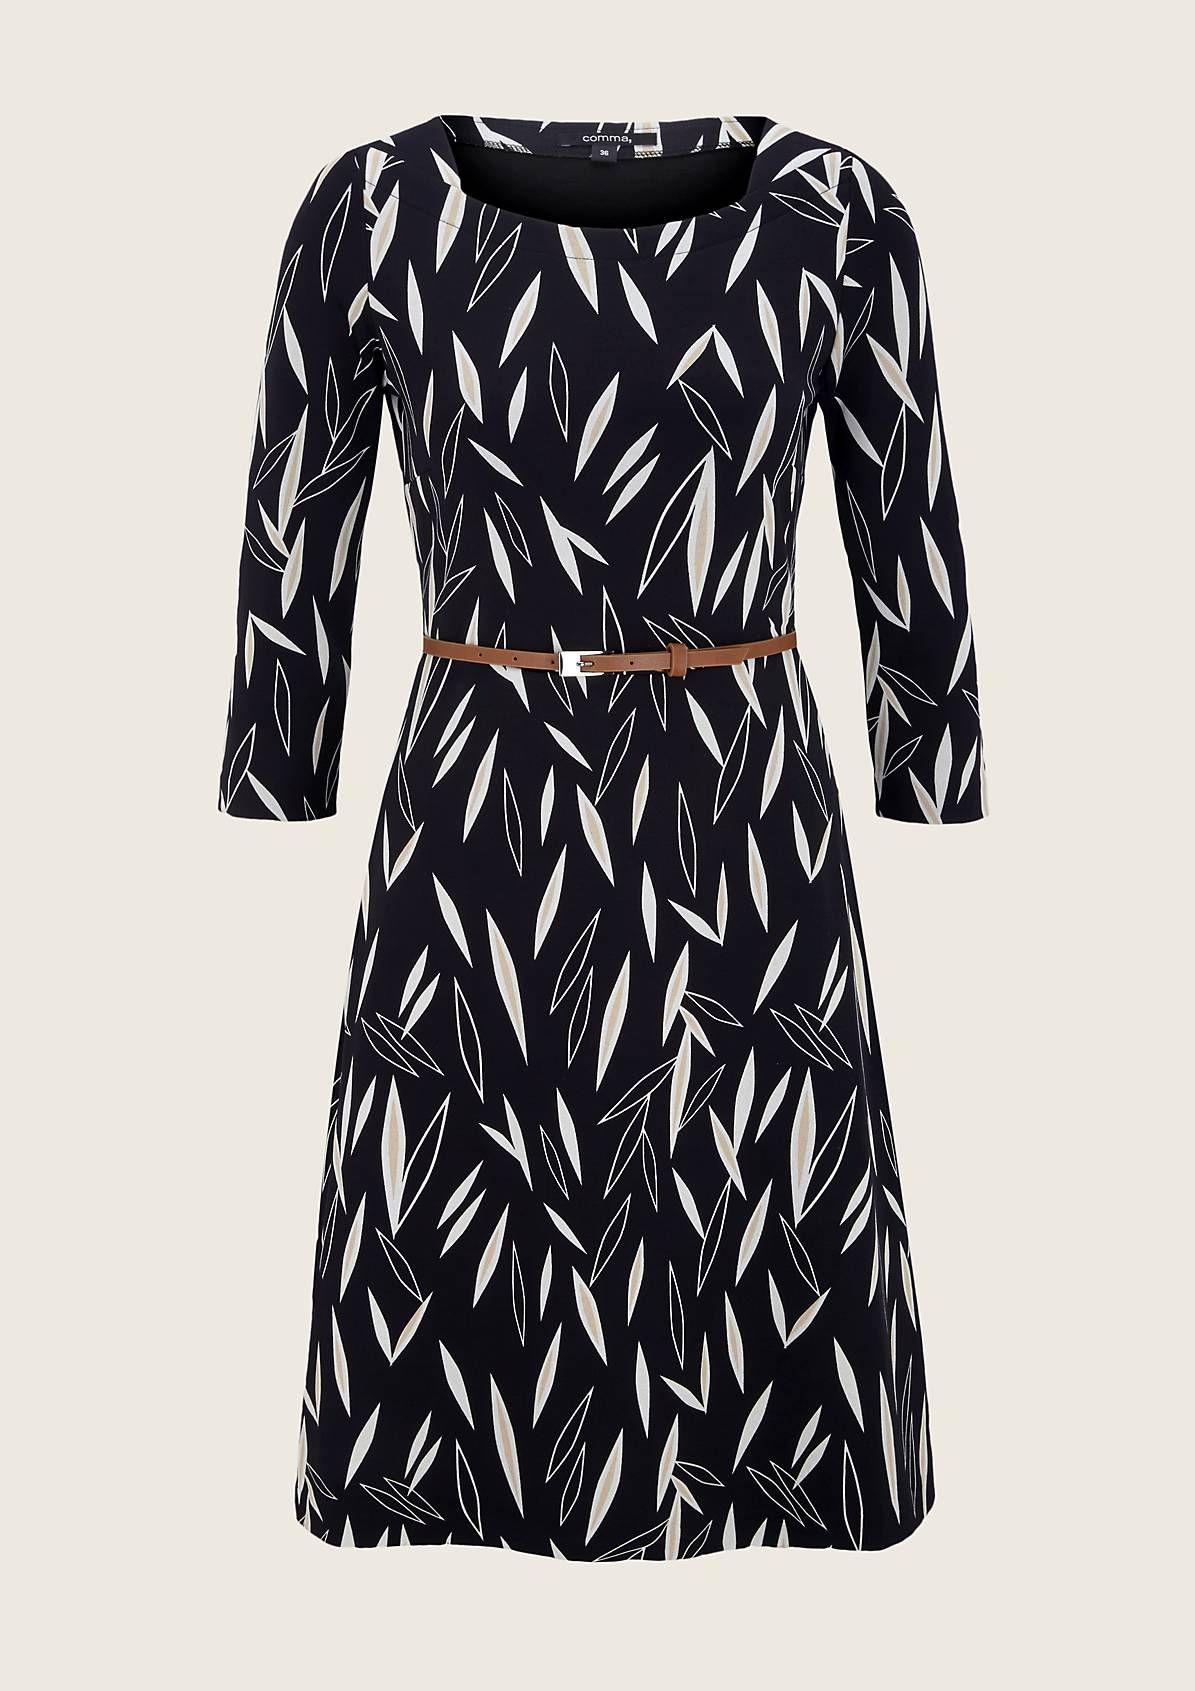 musterkleid 81.601.82.3357   fashion & mode   comma online